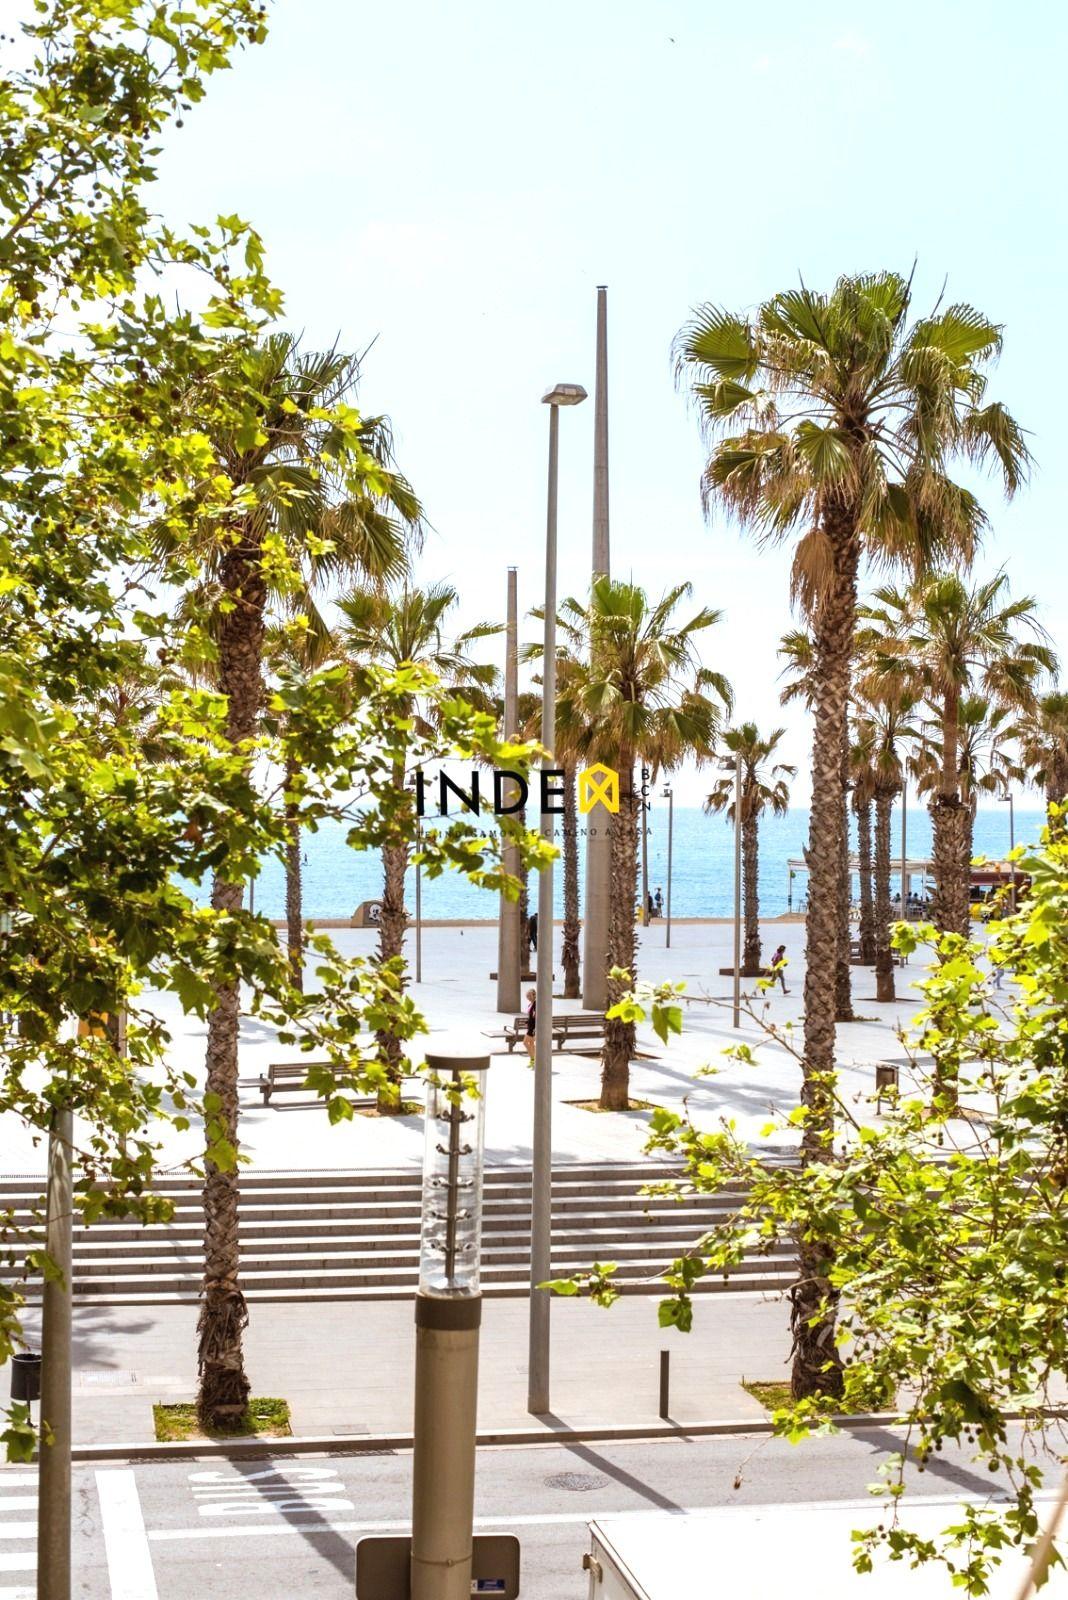 Piso en Barcelona, alquiler vacacional